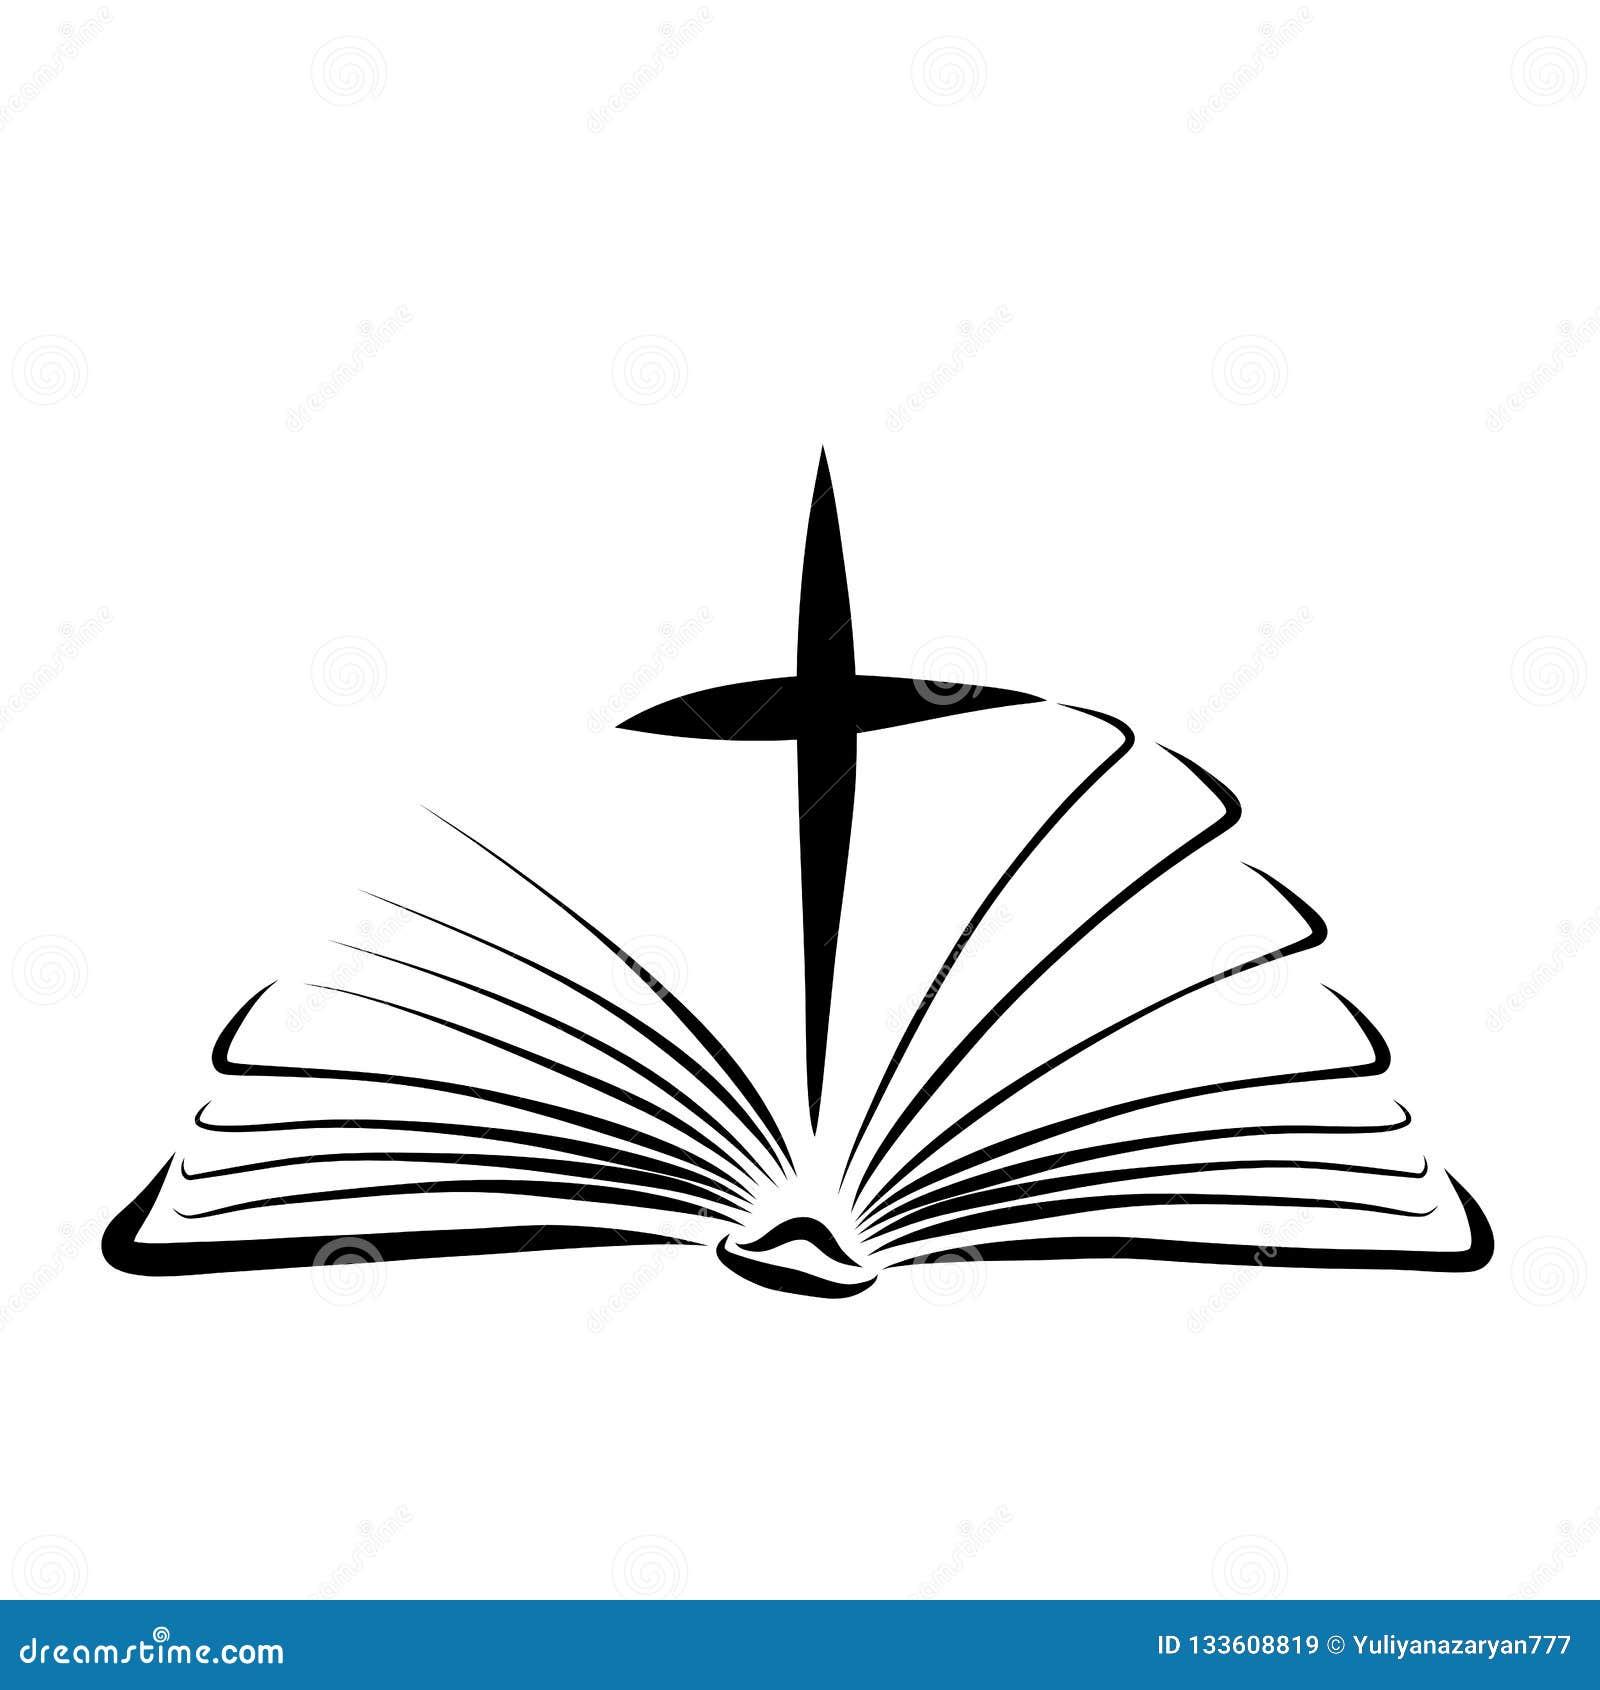 Cruz Entre Paginas De Uma Biblia Aberta Novo Testamento Ilustracao Stock Ilustracao De Coloracao Grace 133608819